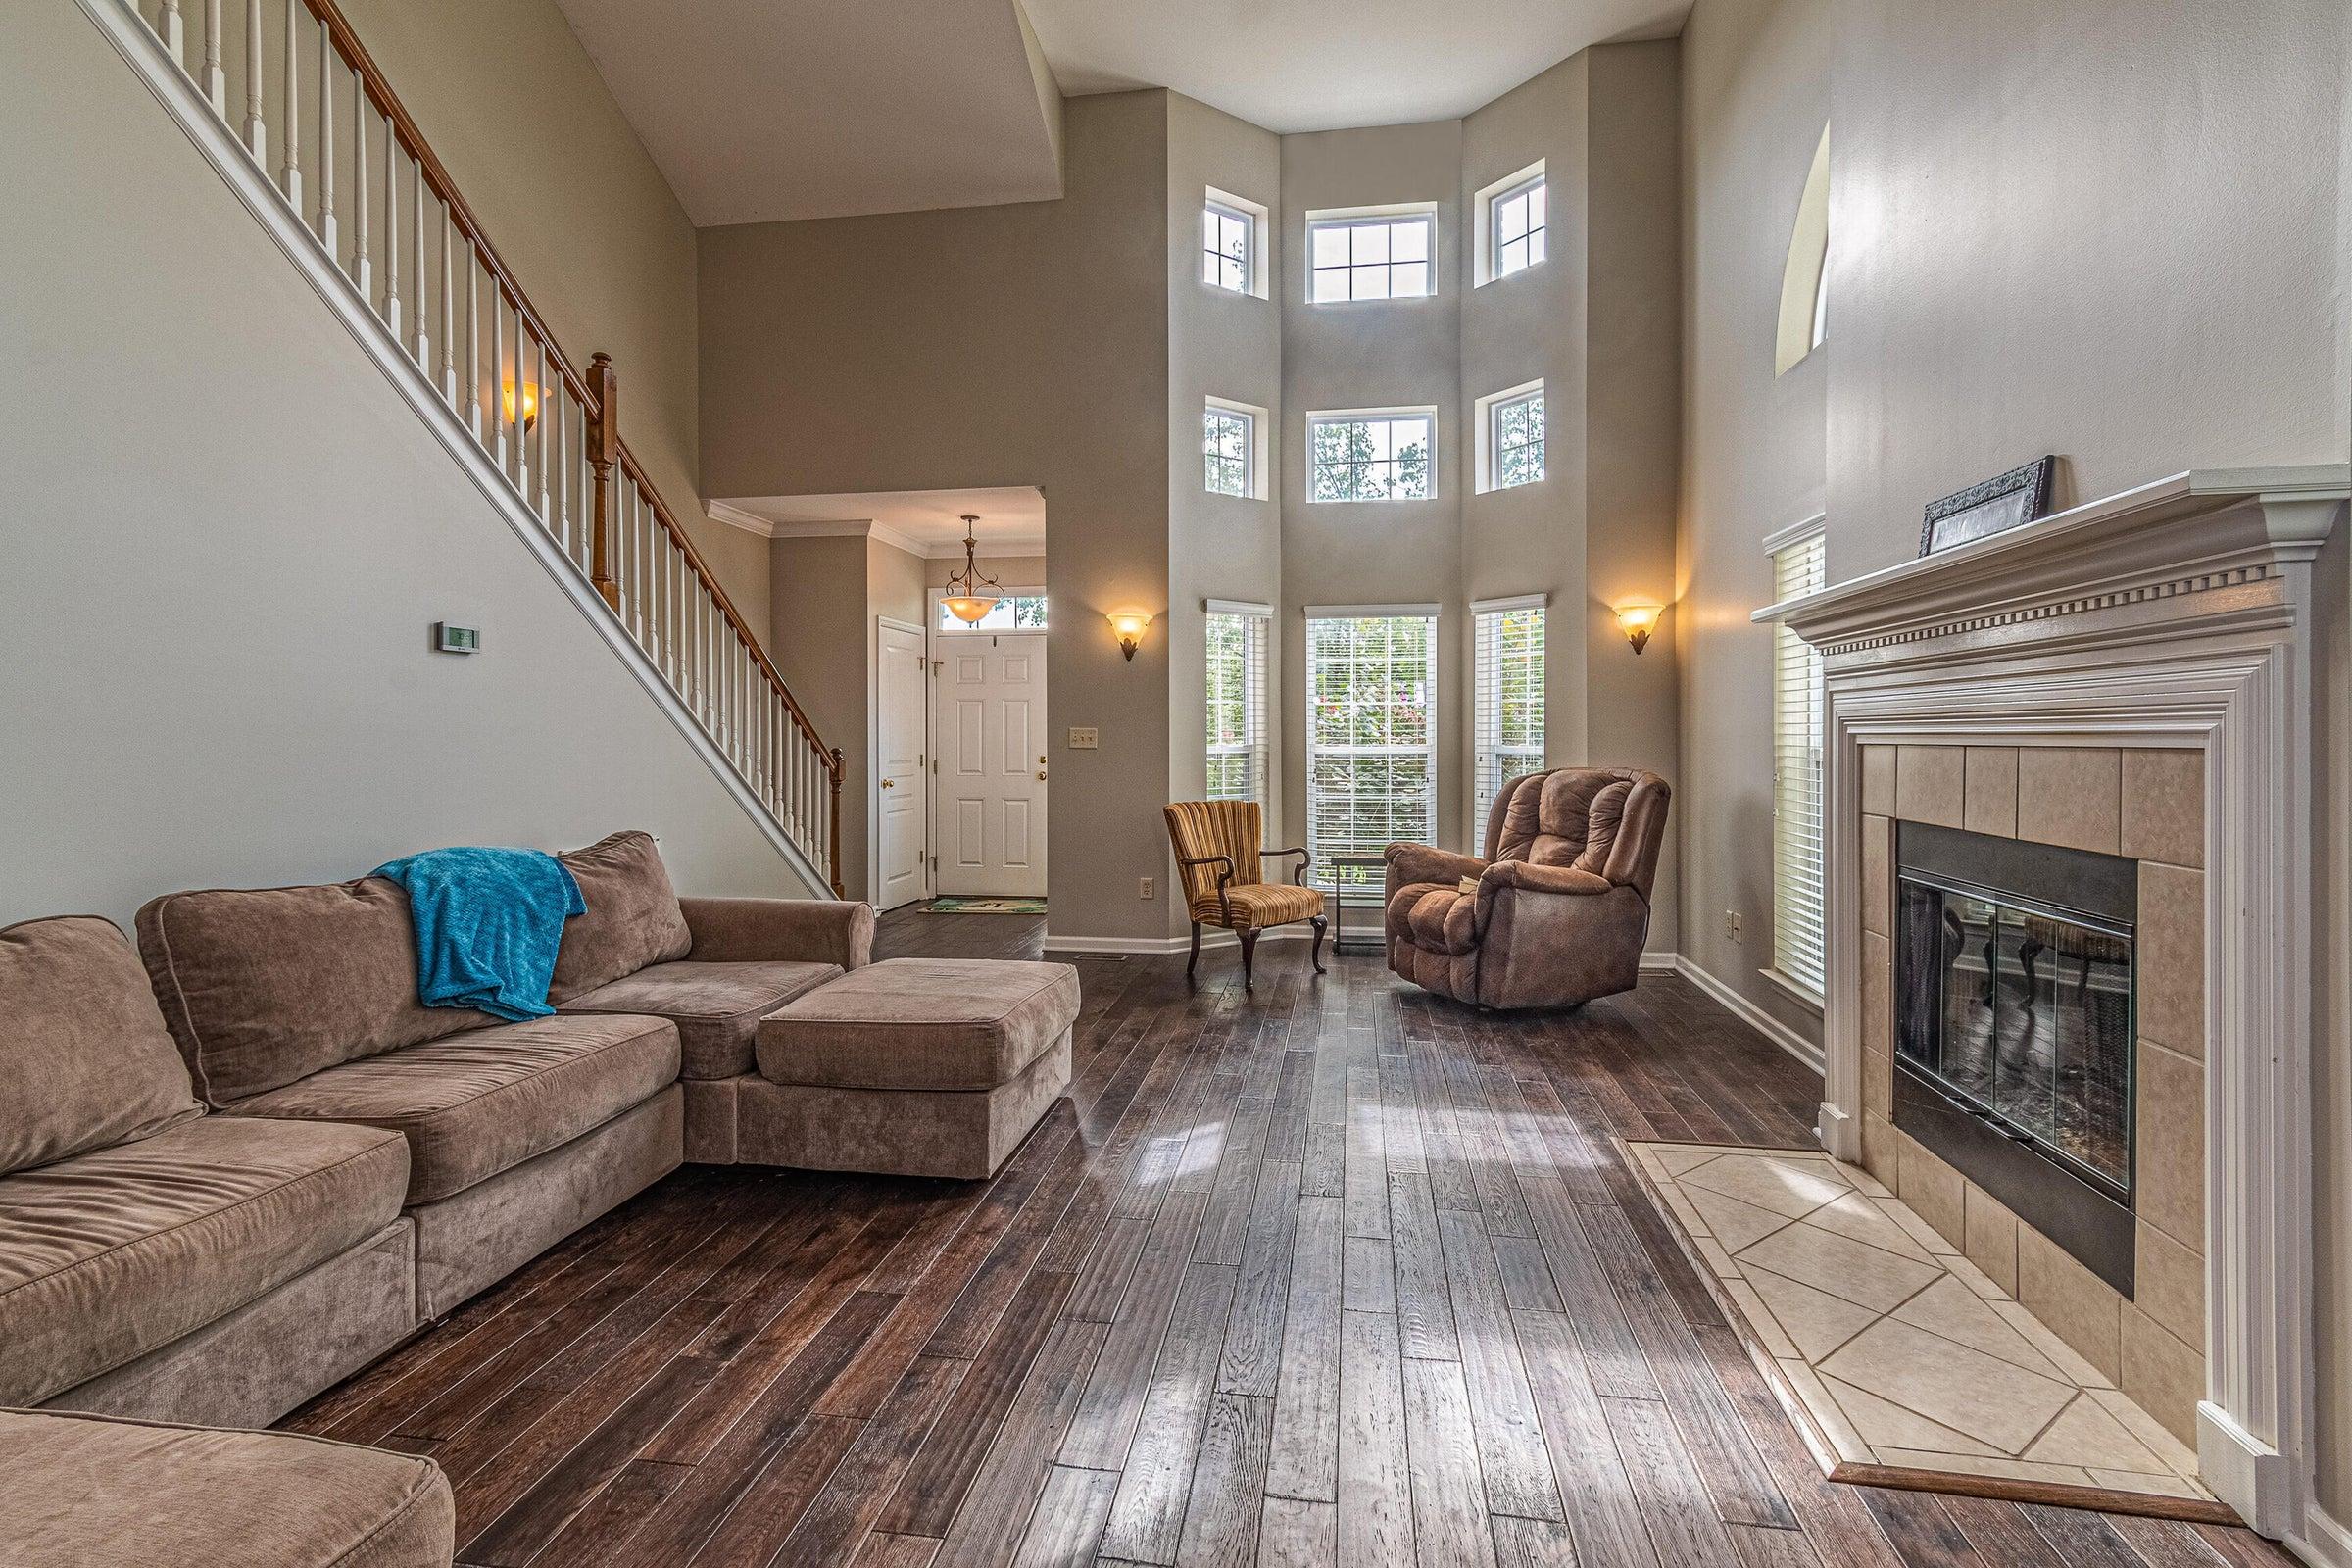 Floor to ceiling light